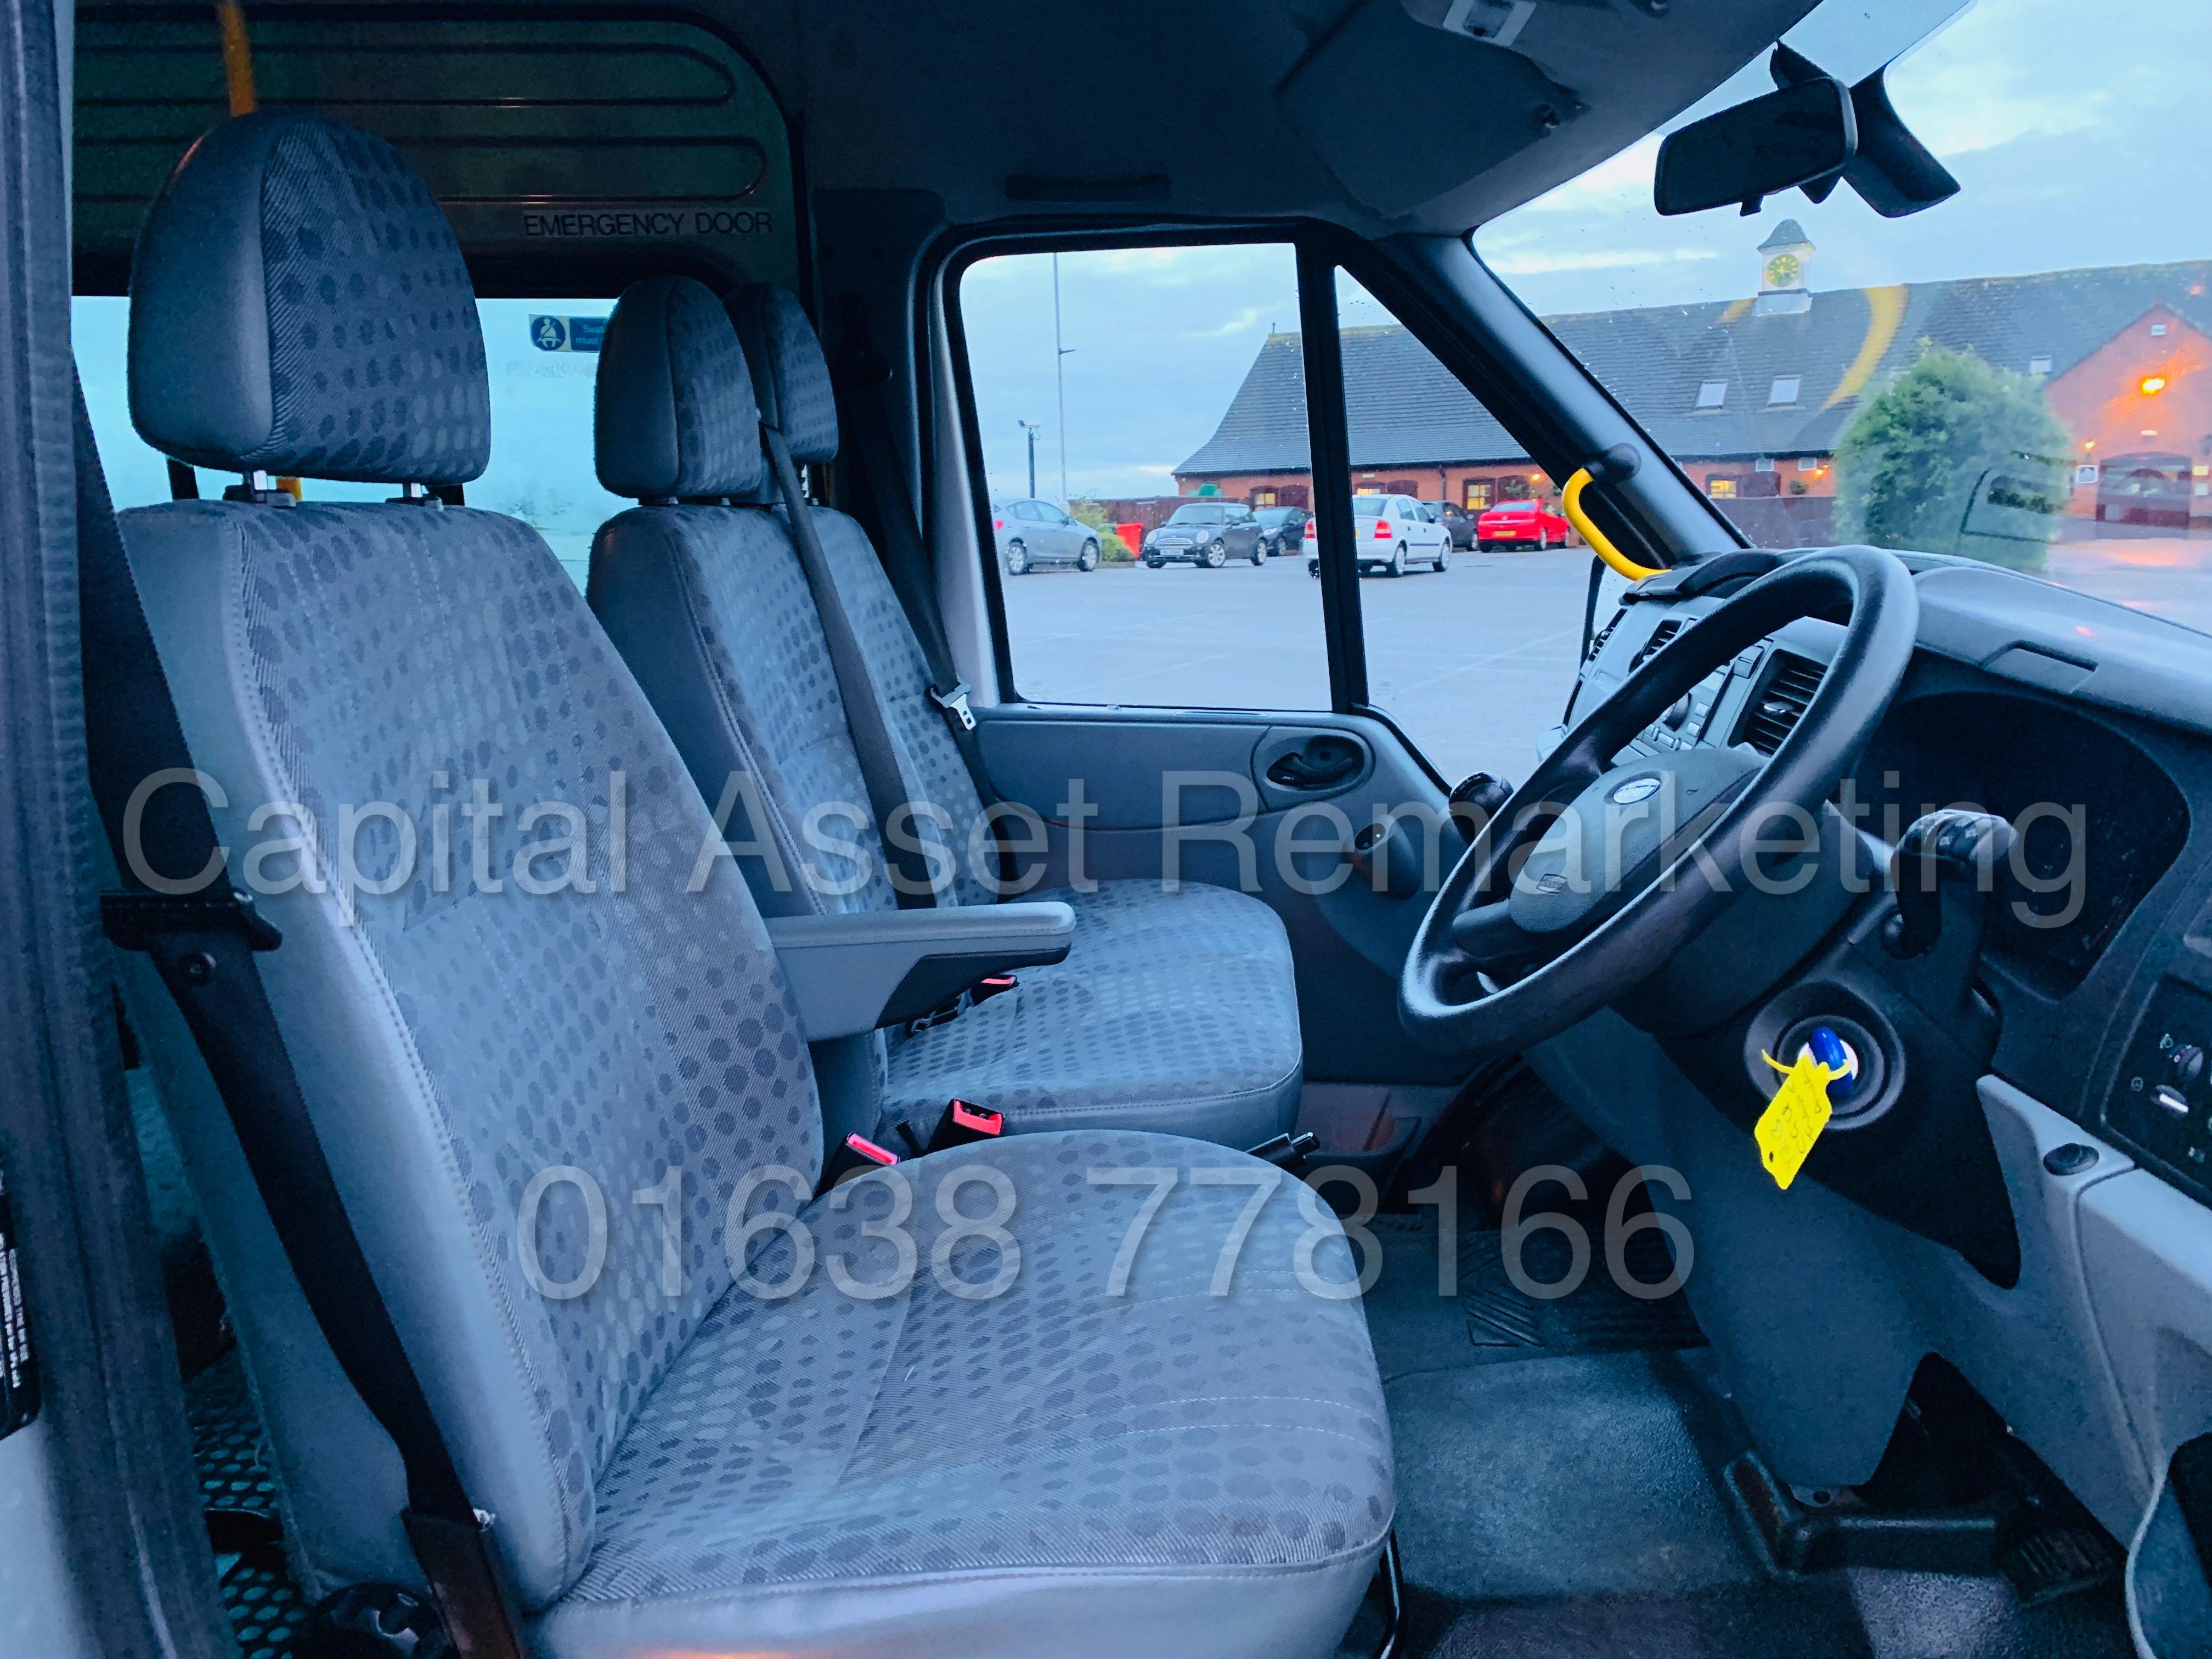 FORD TRANSIT 135 T430 RWD *XLWB -17 SEATER MINI-BUS* (2013) '2.2 TDCI - 135 BHP - 6 SPEED' (1 OWNER) - Image 30 of 43